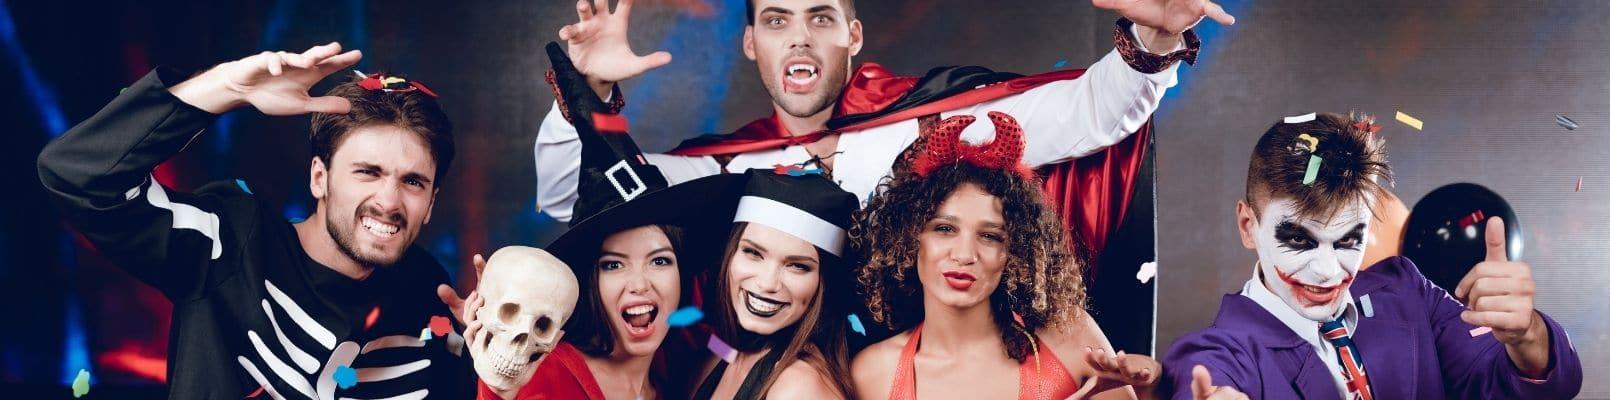 halloween 2020 costume